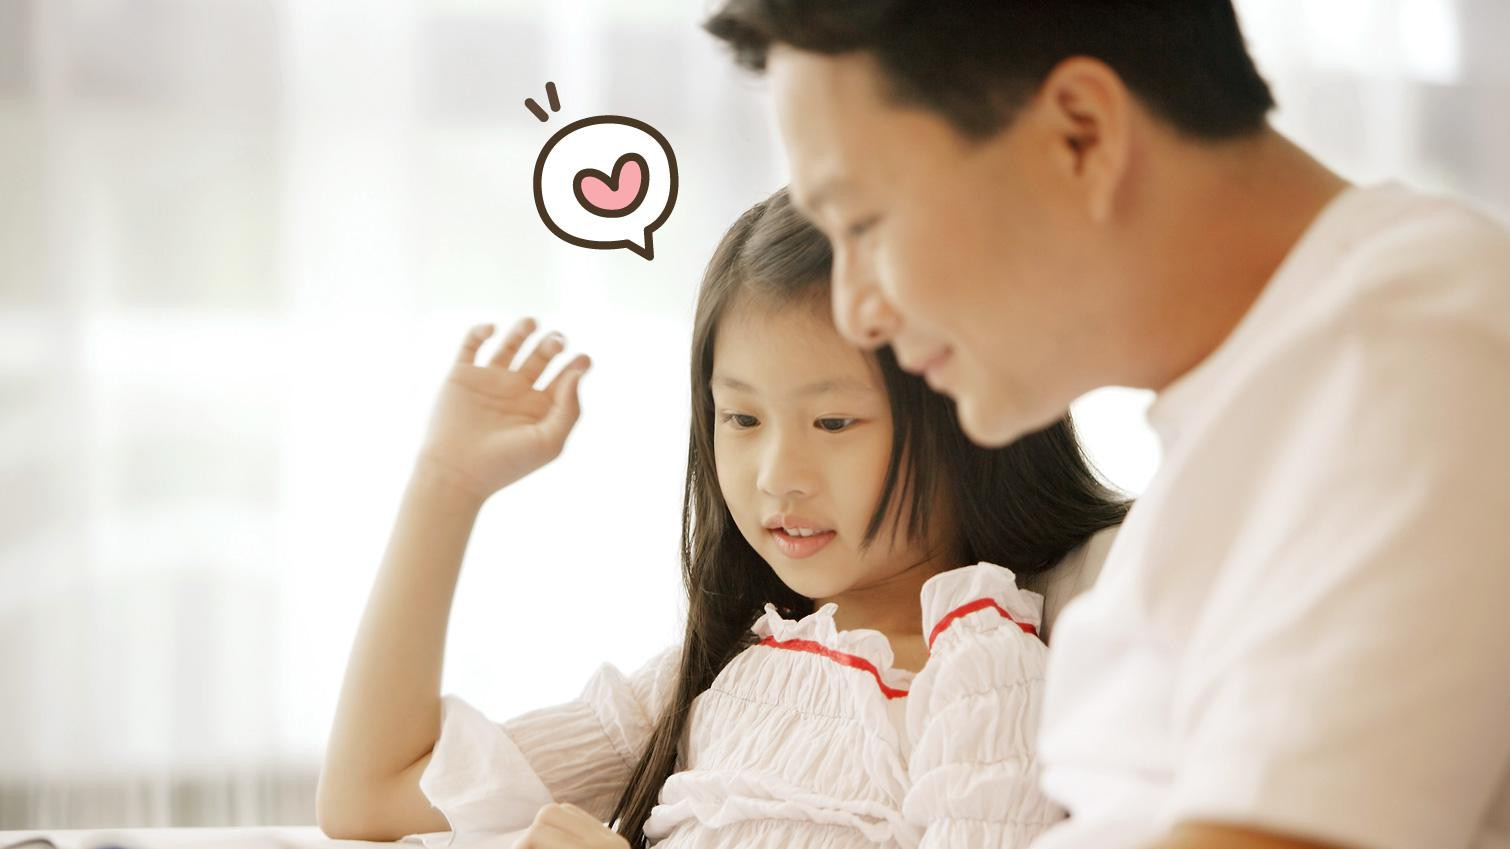 Kenapa Anak Perempuan Lebih Dekat Ke Ayah Dan Anak Lelaki Lebih Dekat Ke Ibu